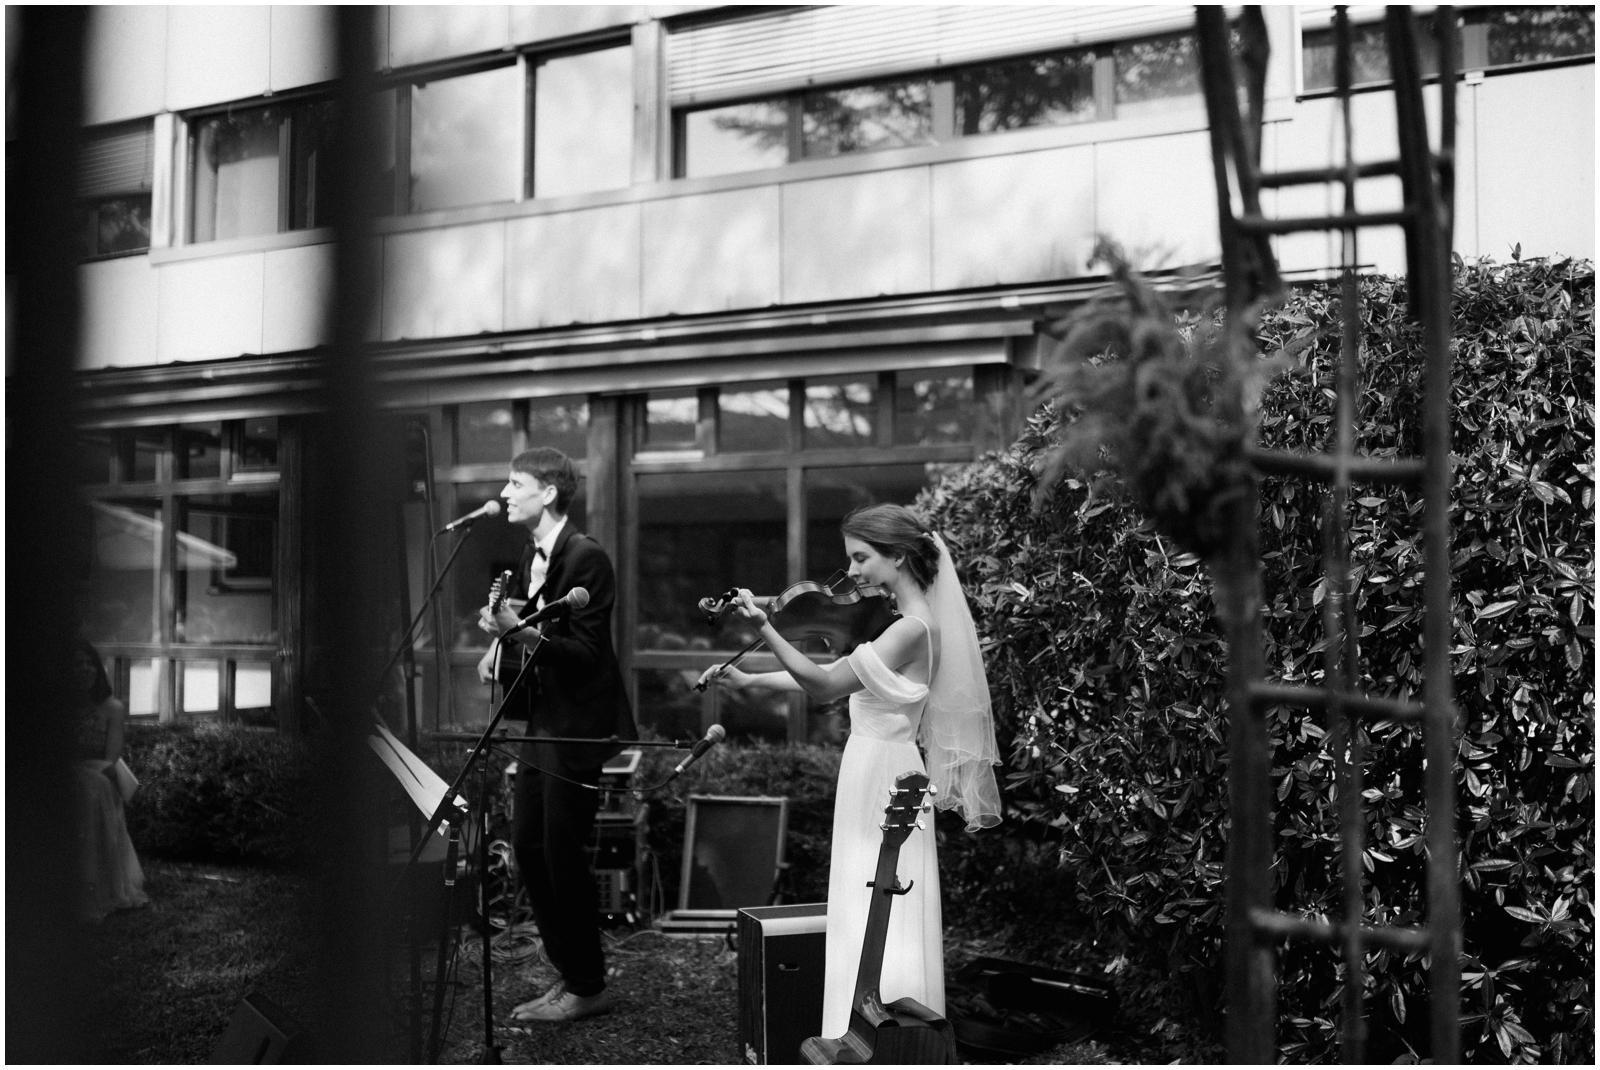 mirjam_thomas_wedding-434-2.jpg